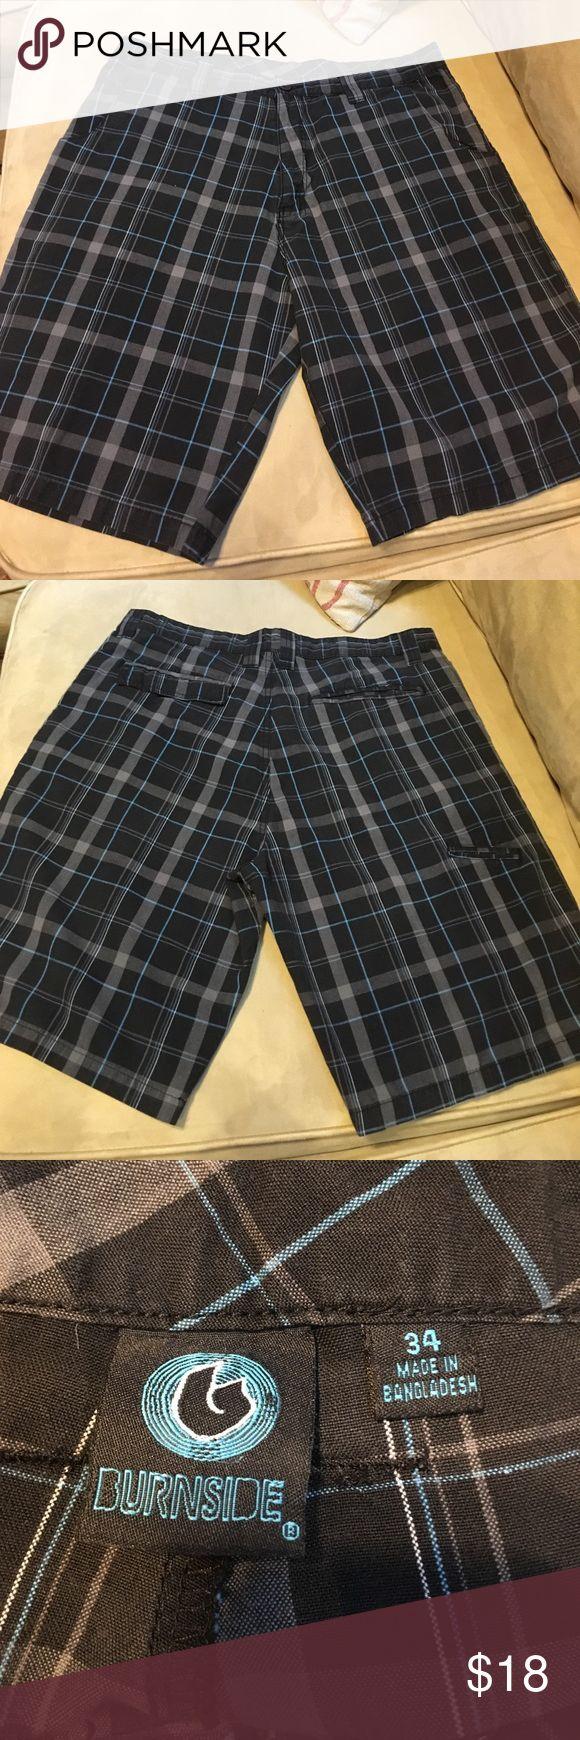 Burnside surfer shorts size 34 Burnside surfer shorts size 34 Burnside Shorts